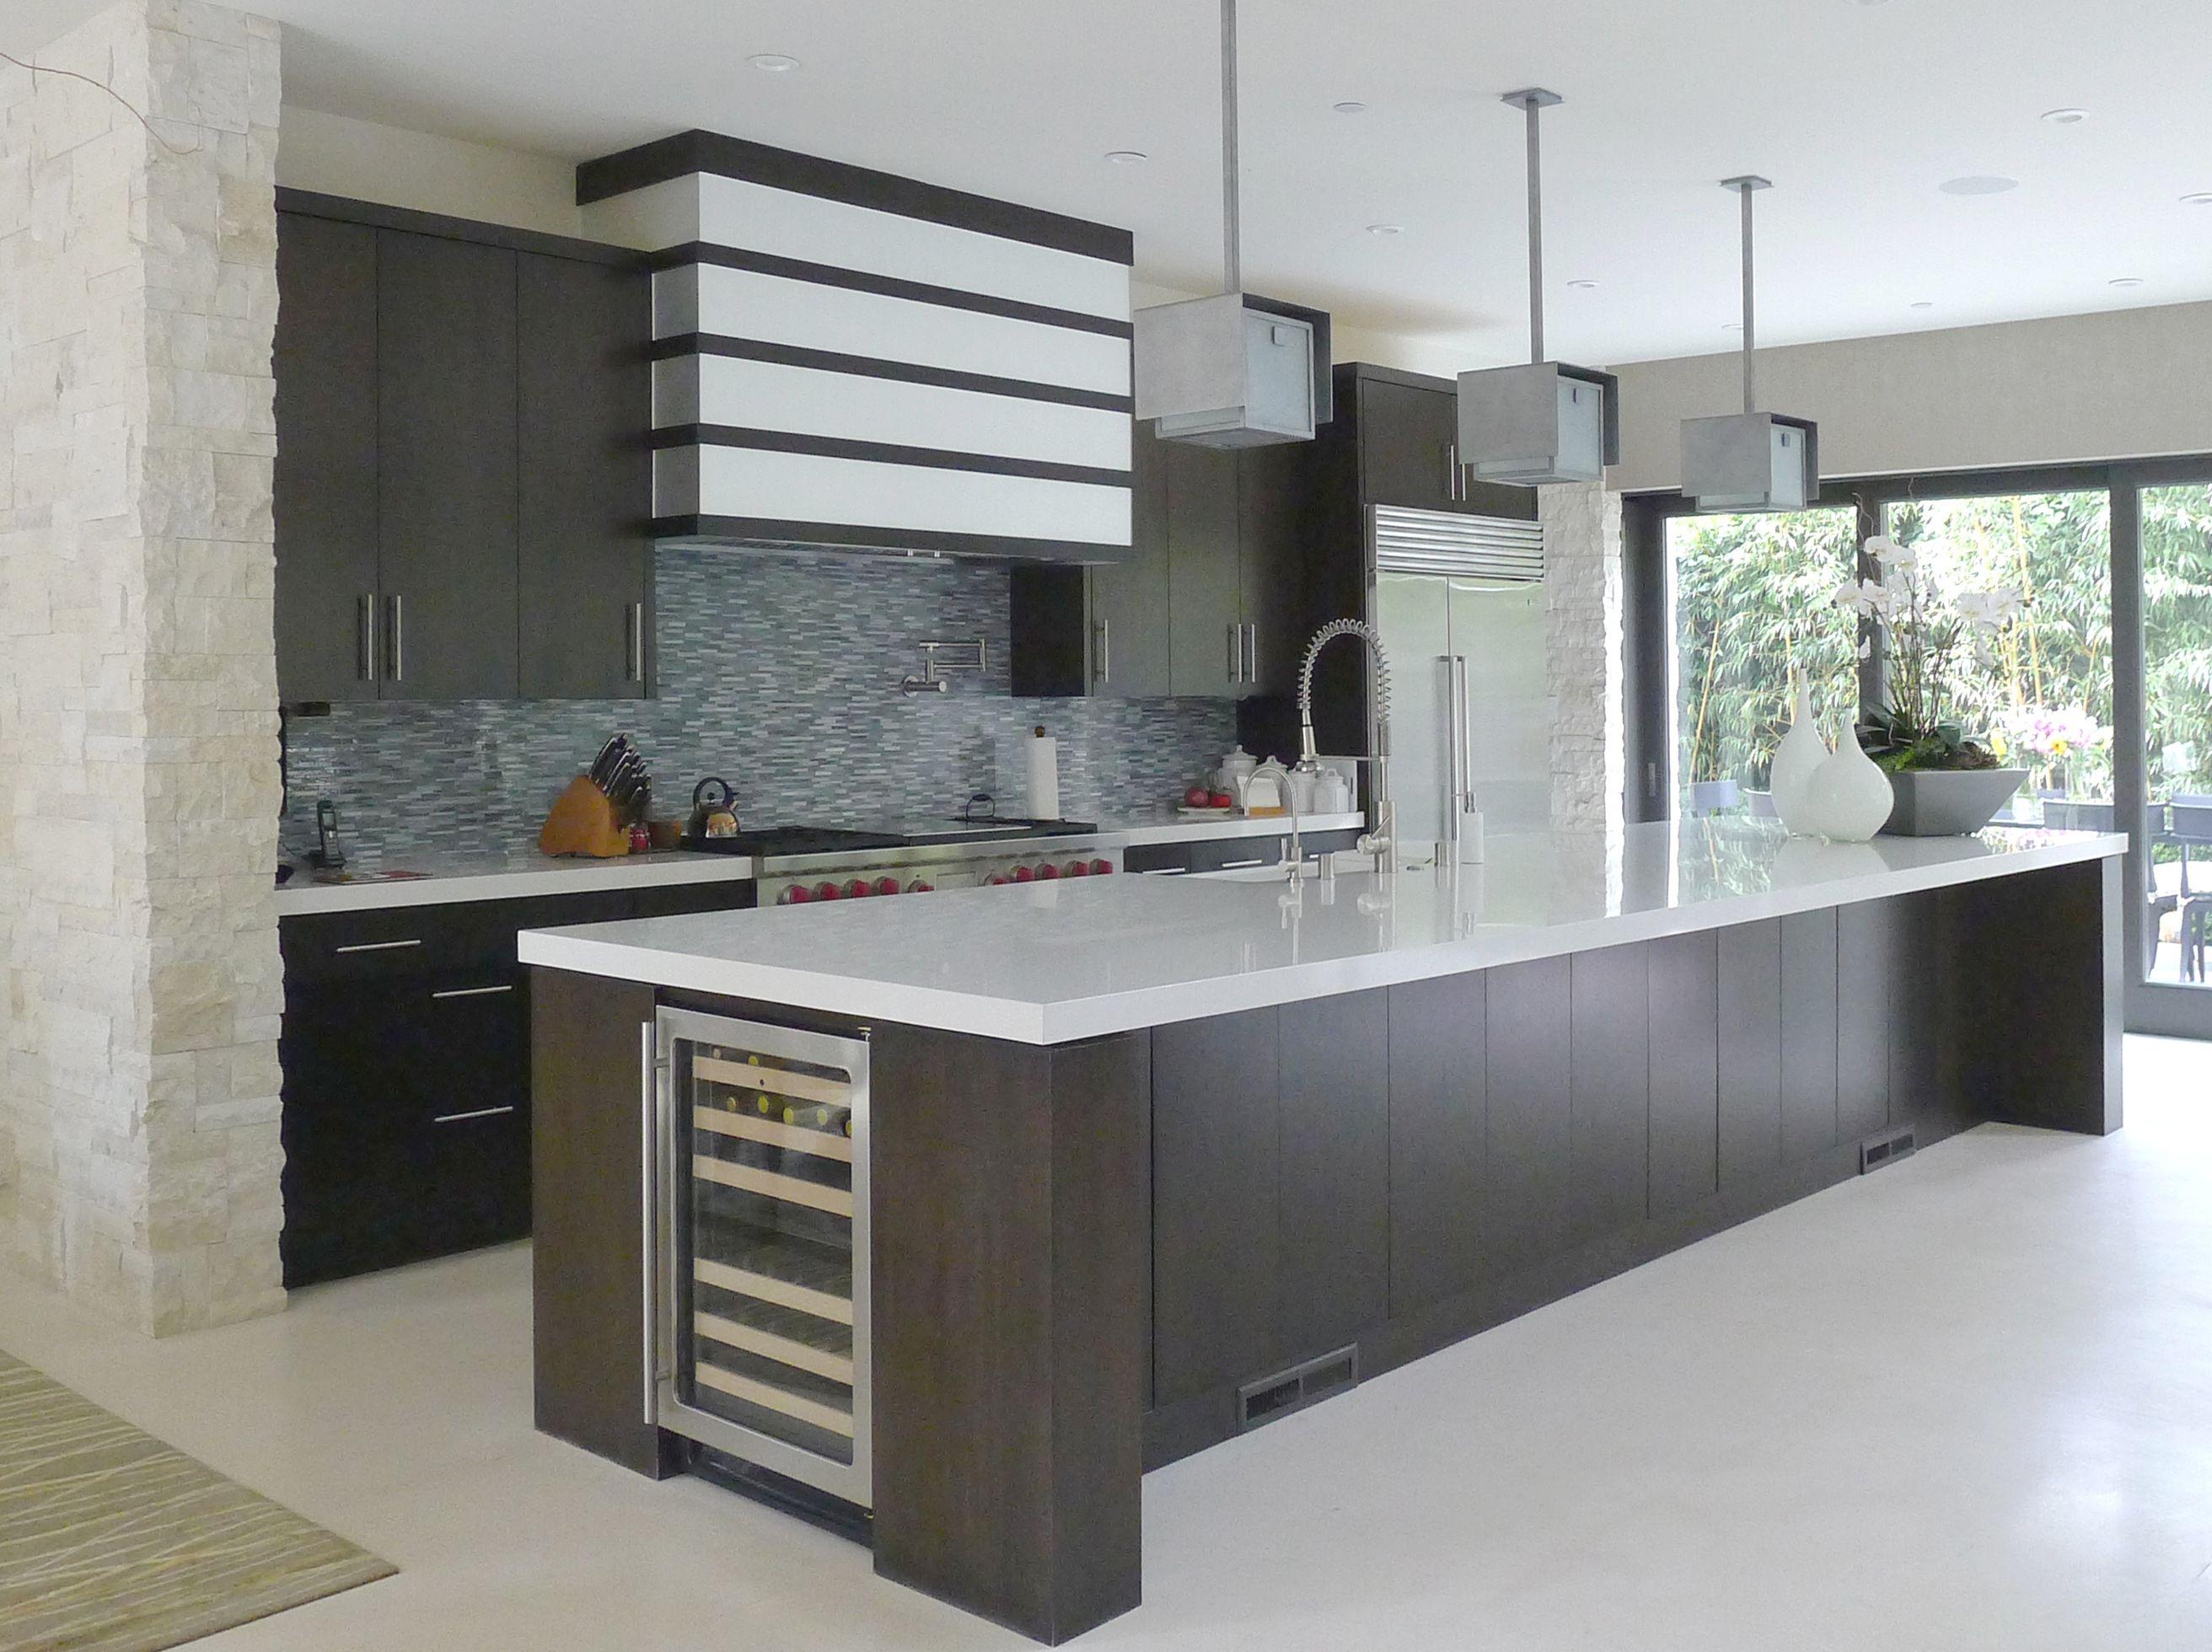 Gorgeous modern kitchen creative homedisign interiordesign